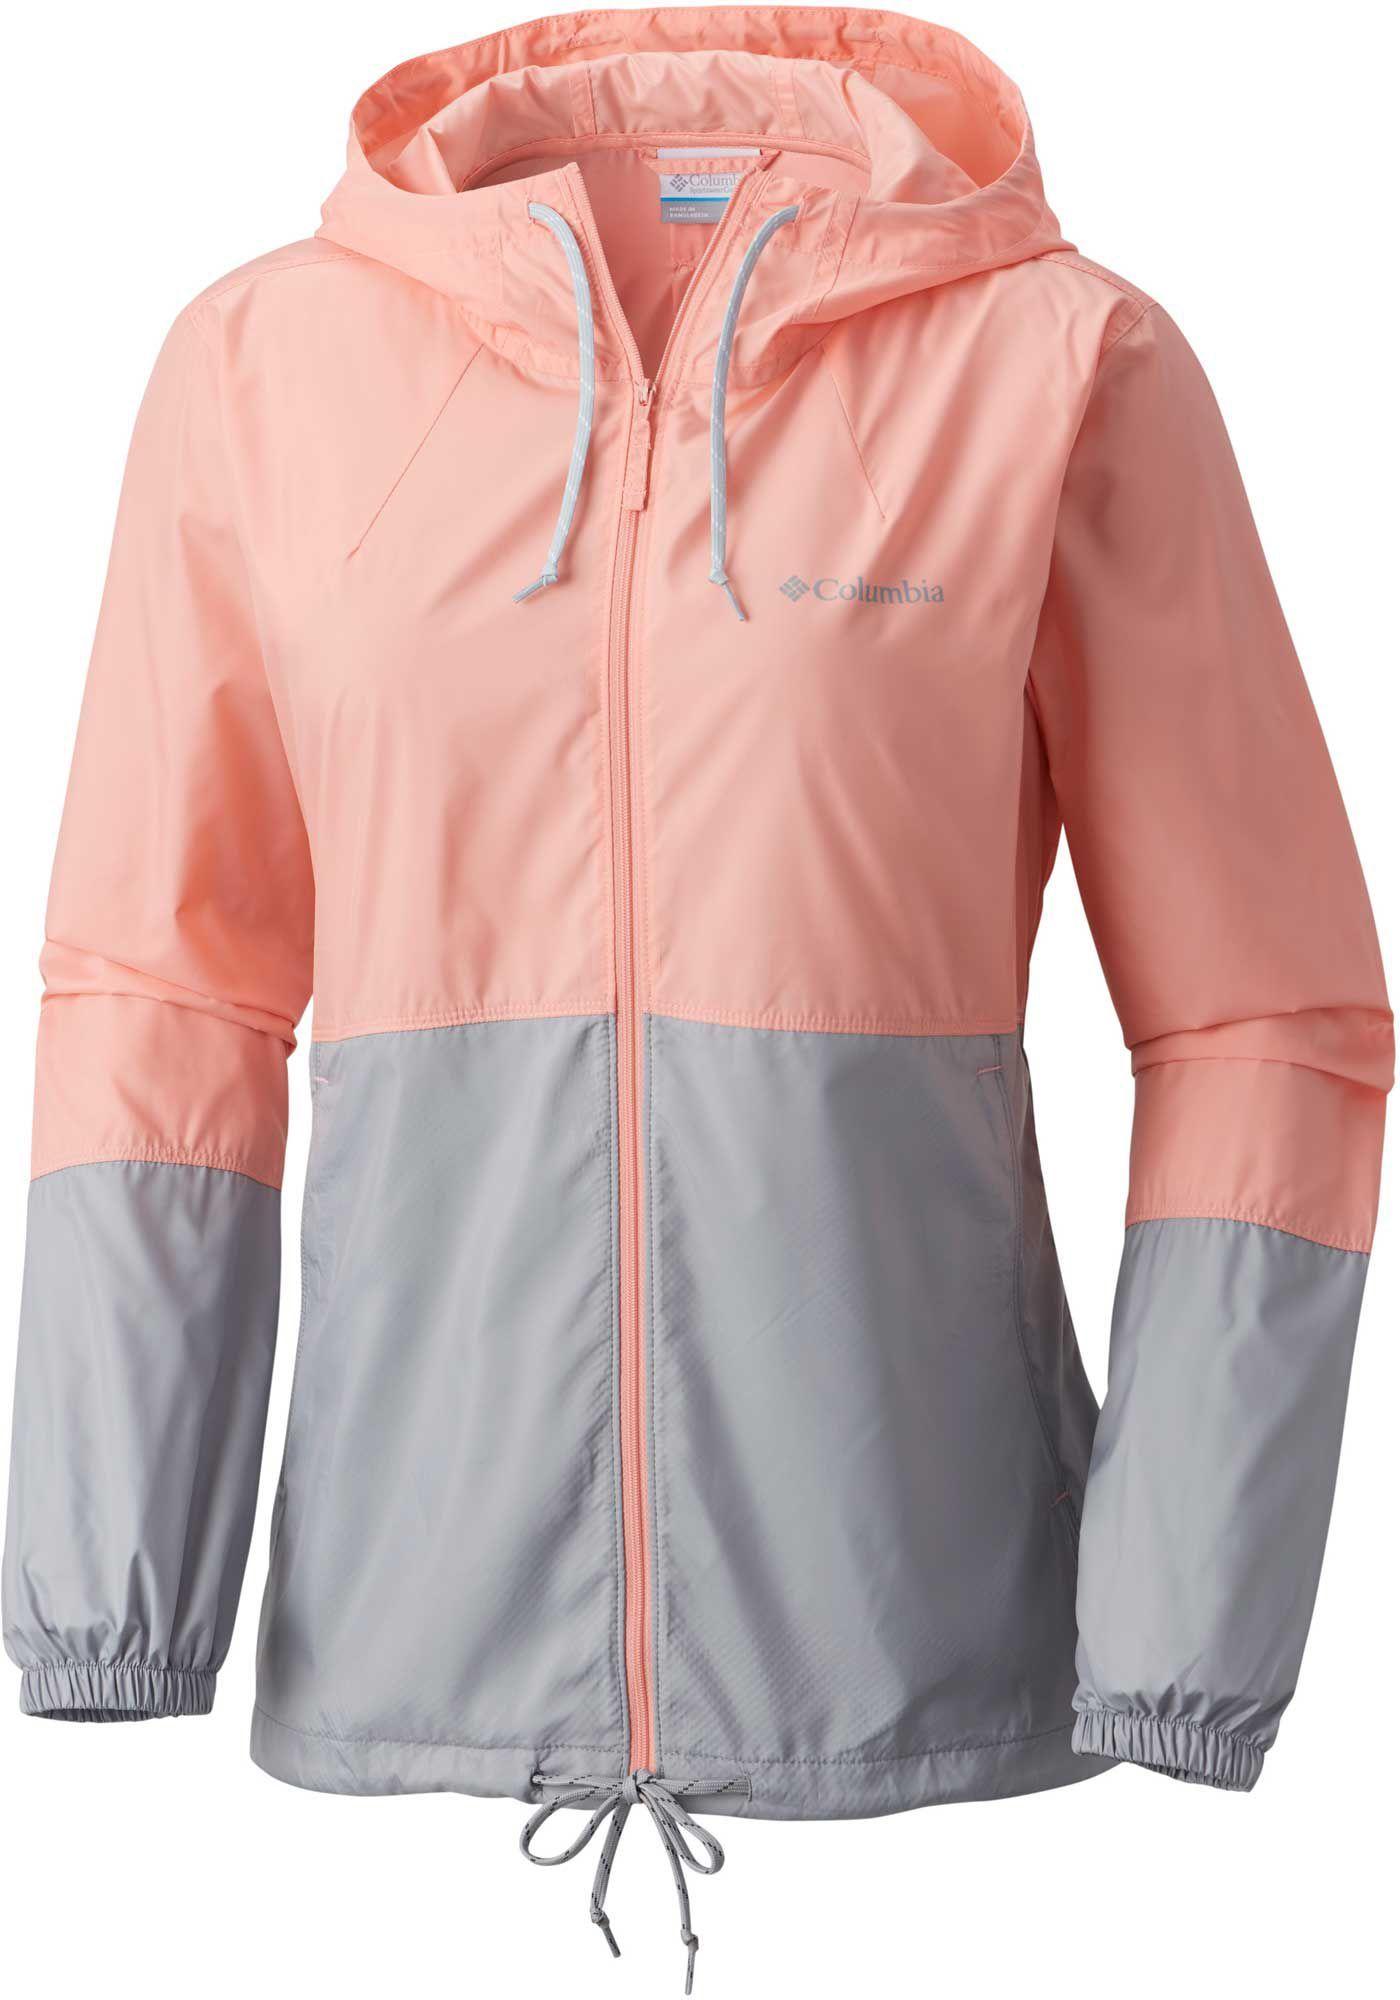 8606716bbff Columbia Women s Flash Forward Windbreaker Jacket